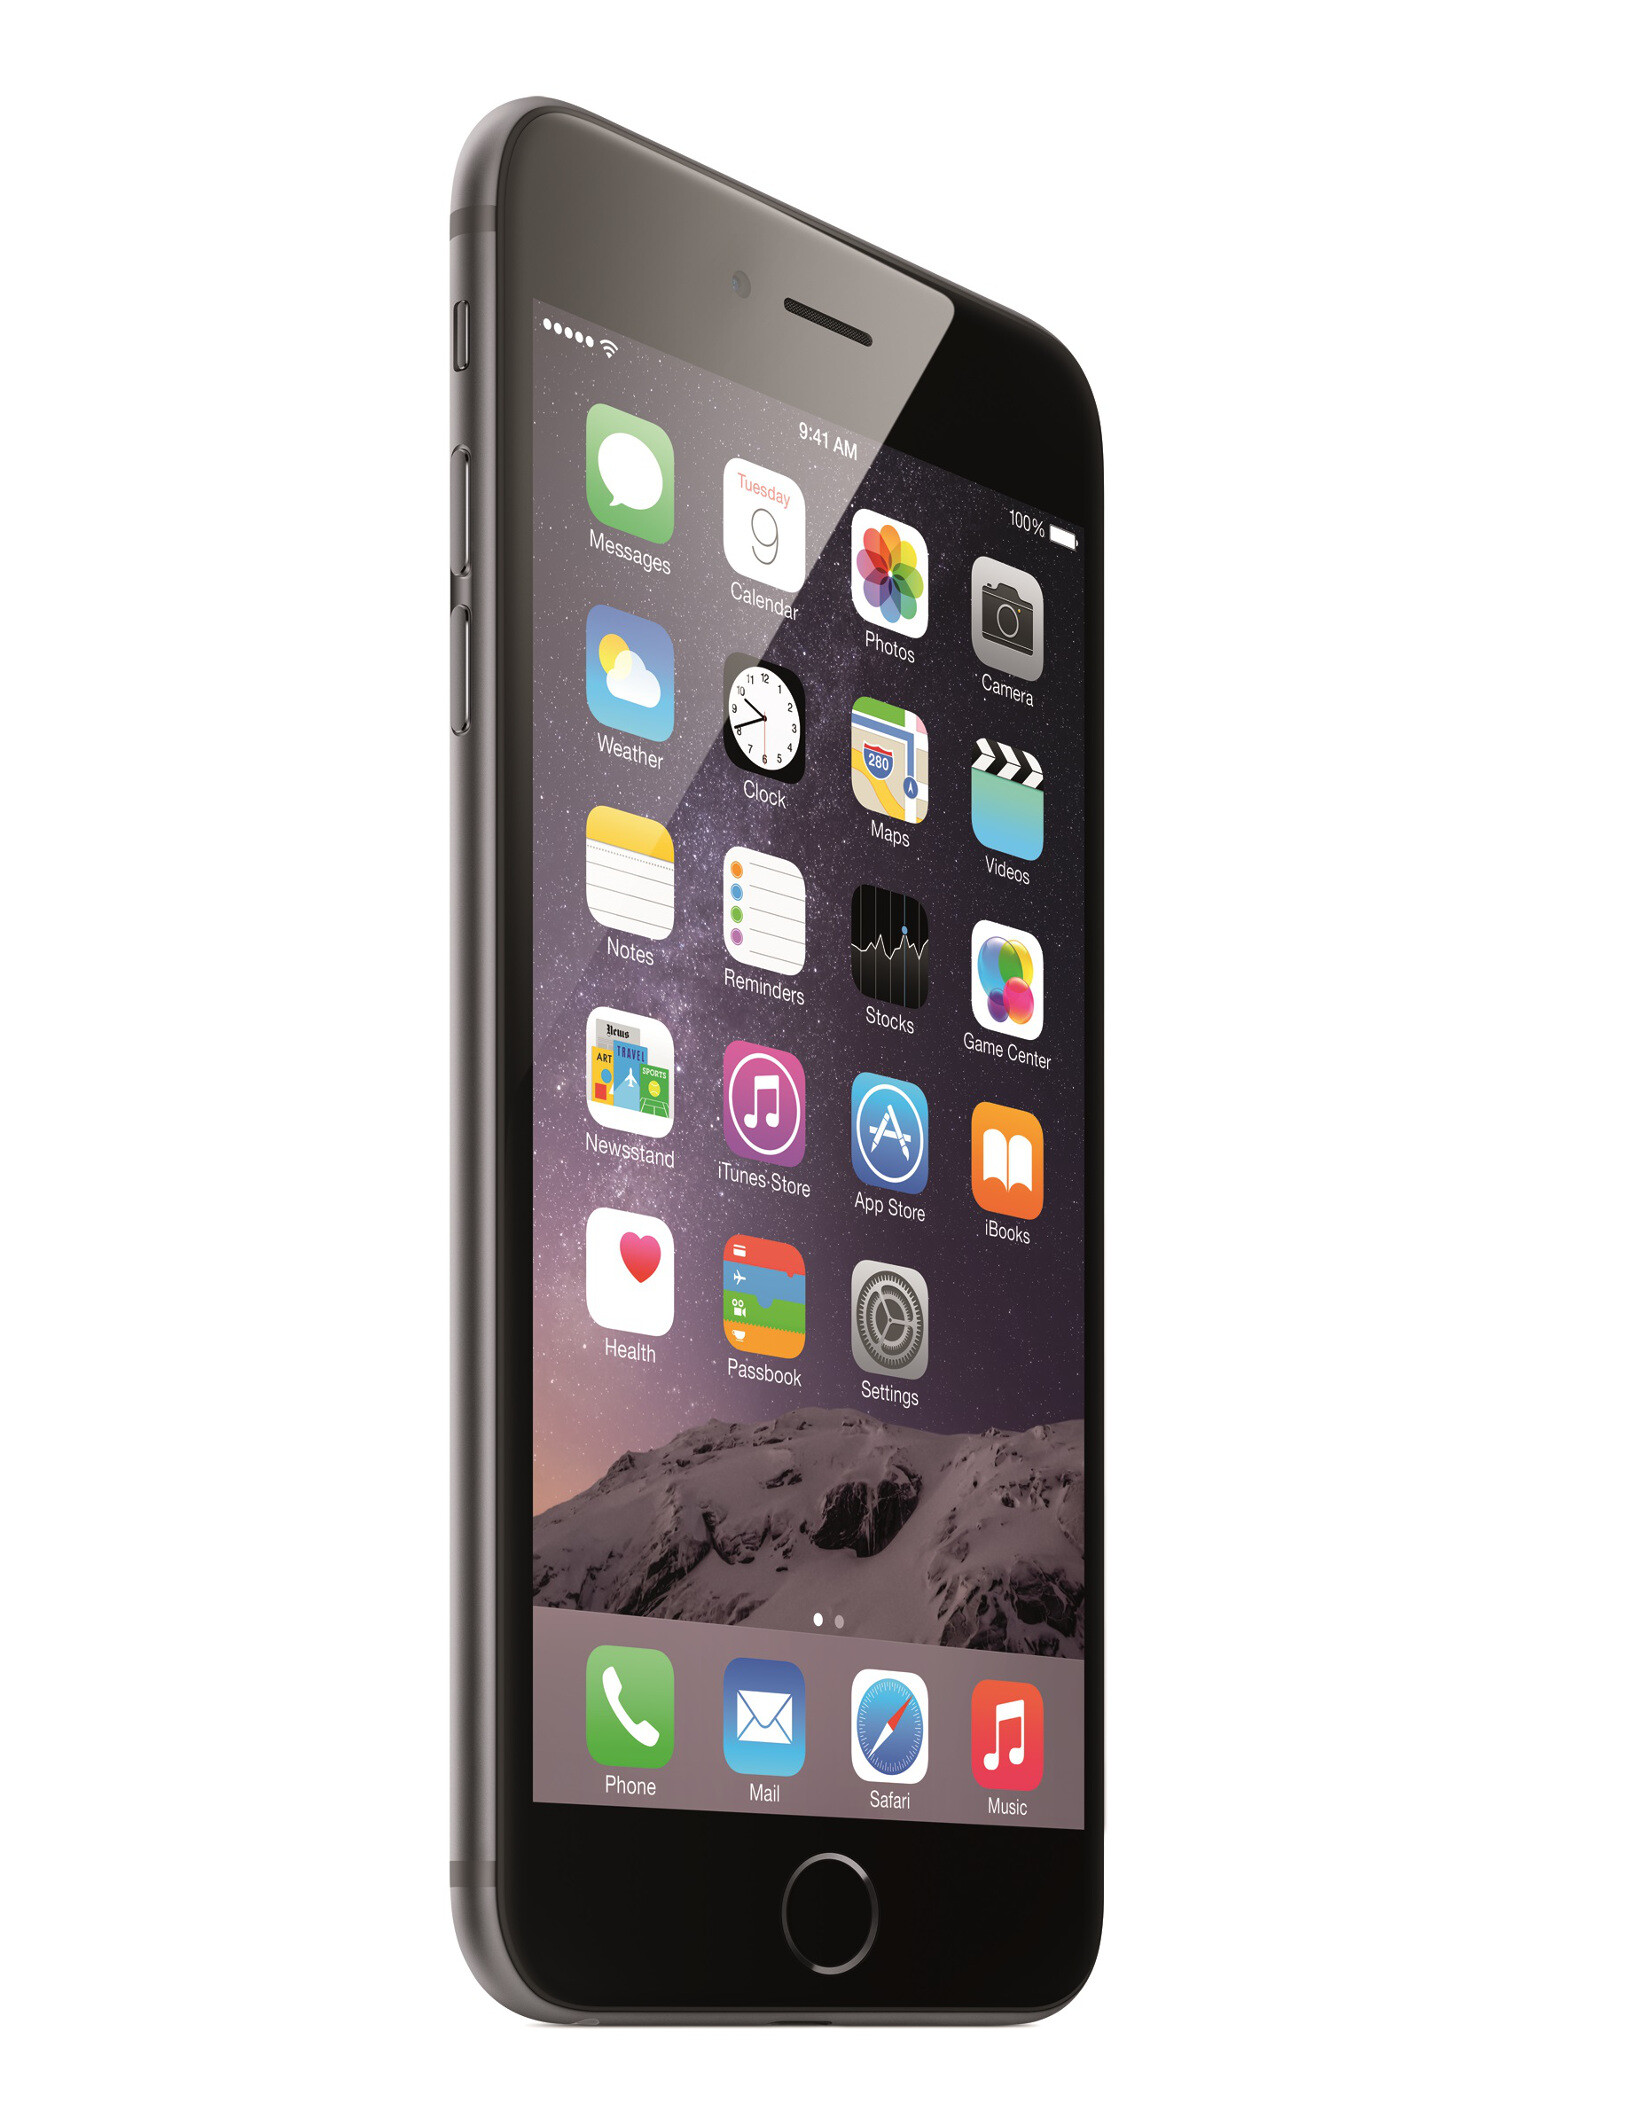 apple iphone 6 plus specs. Black Bedroom Furniture Sets. Home Design Ideas